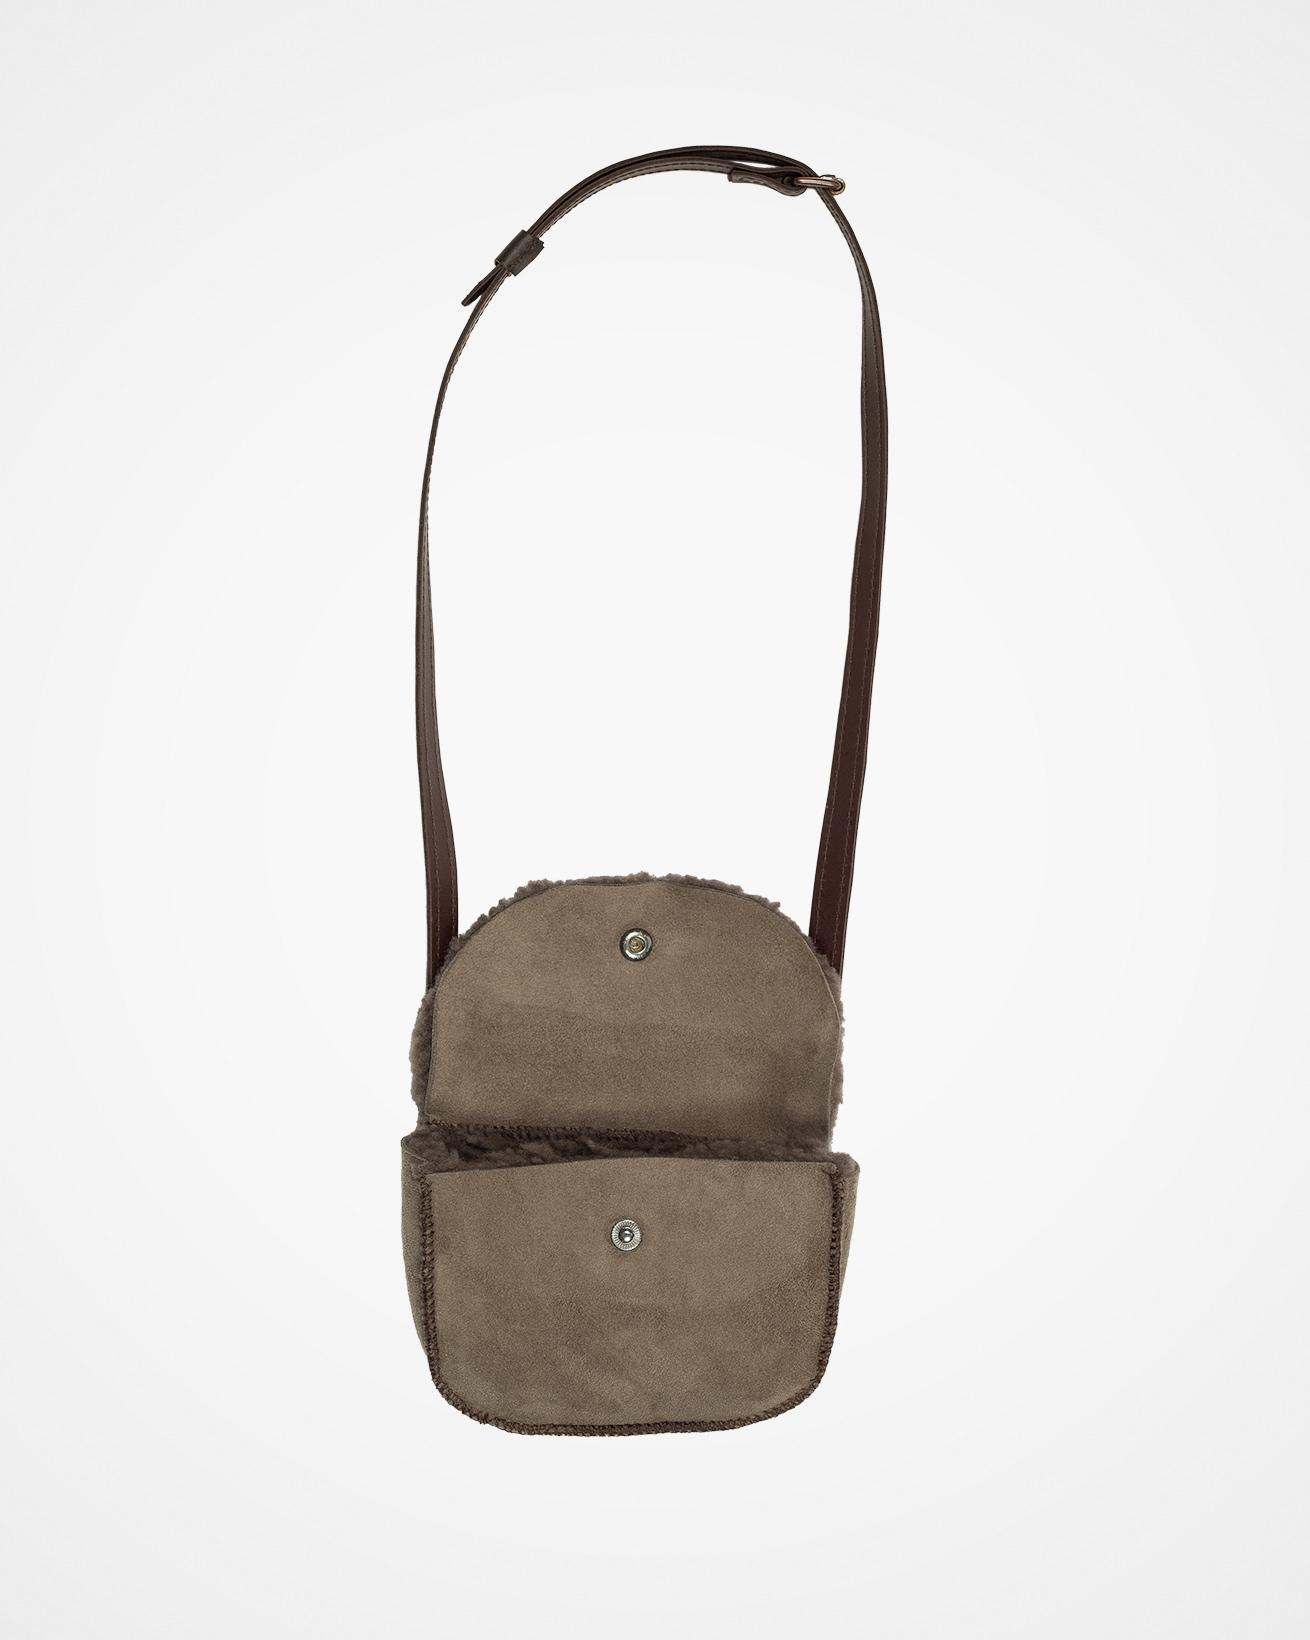 7702_sheepskin-belt-bag_vole_open.jpg